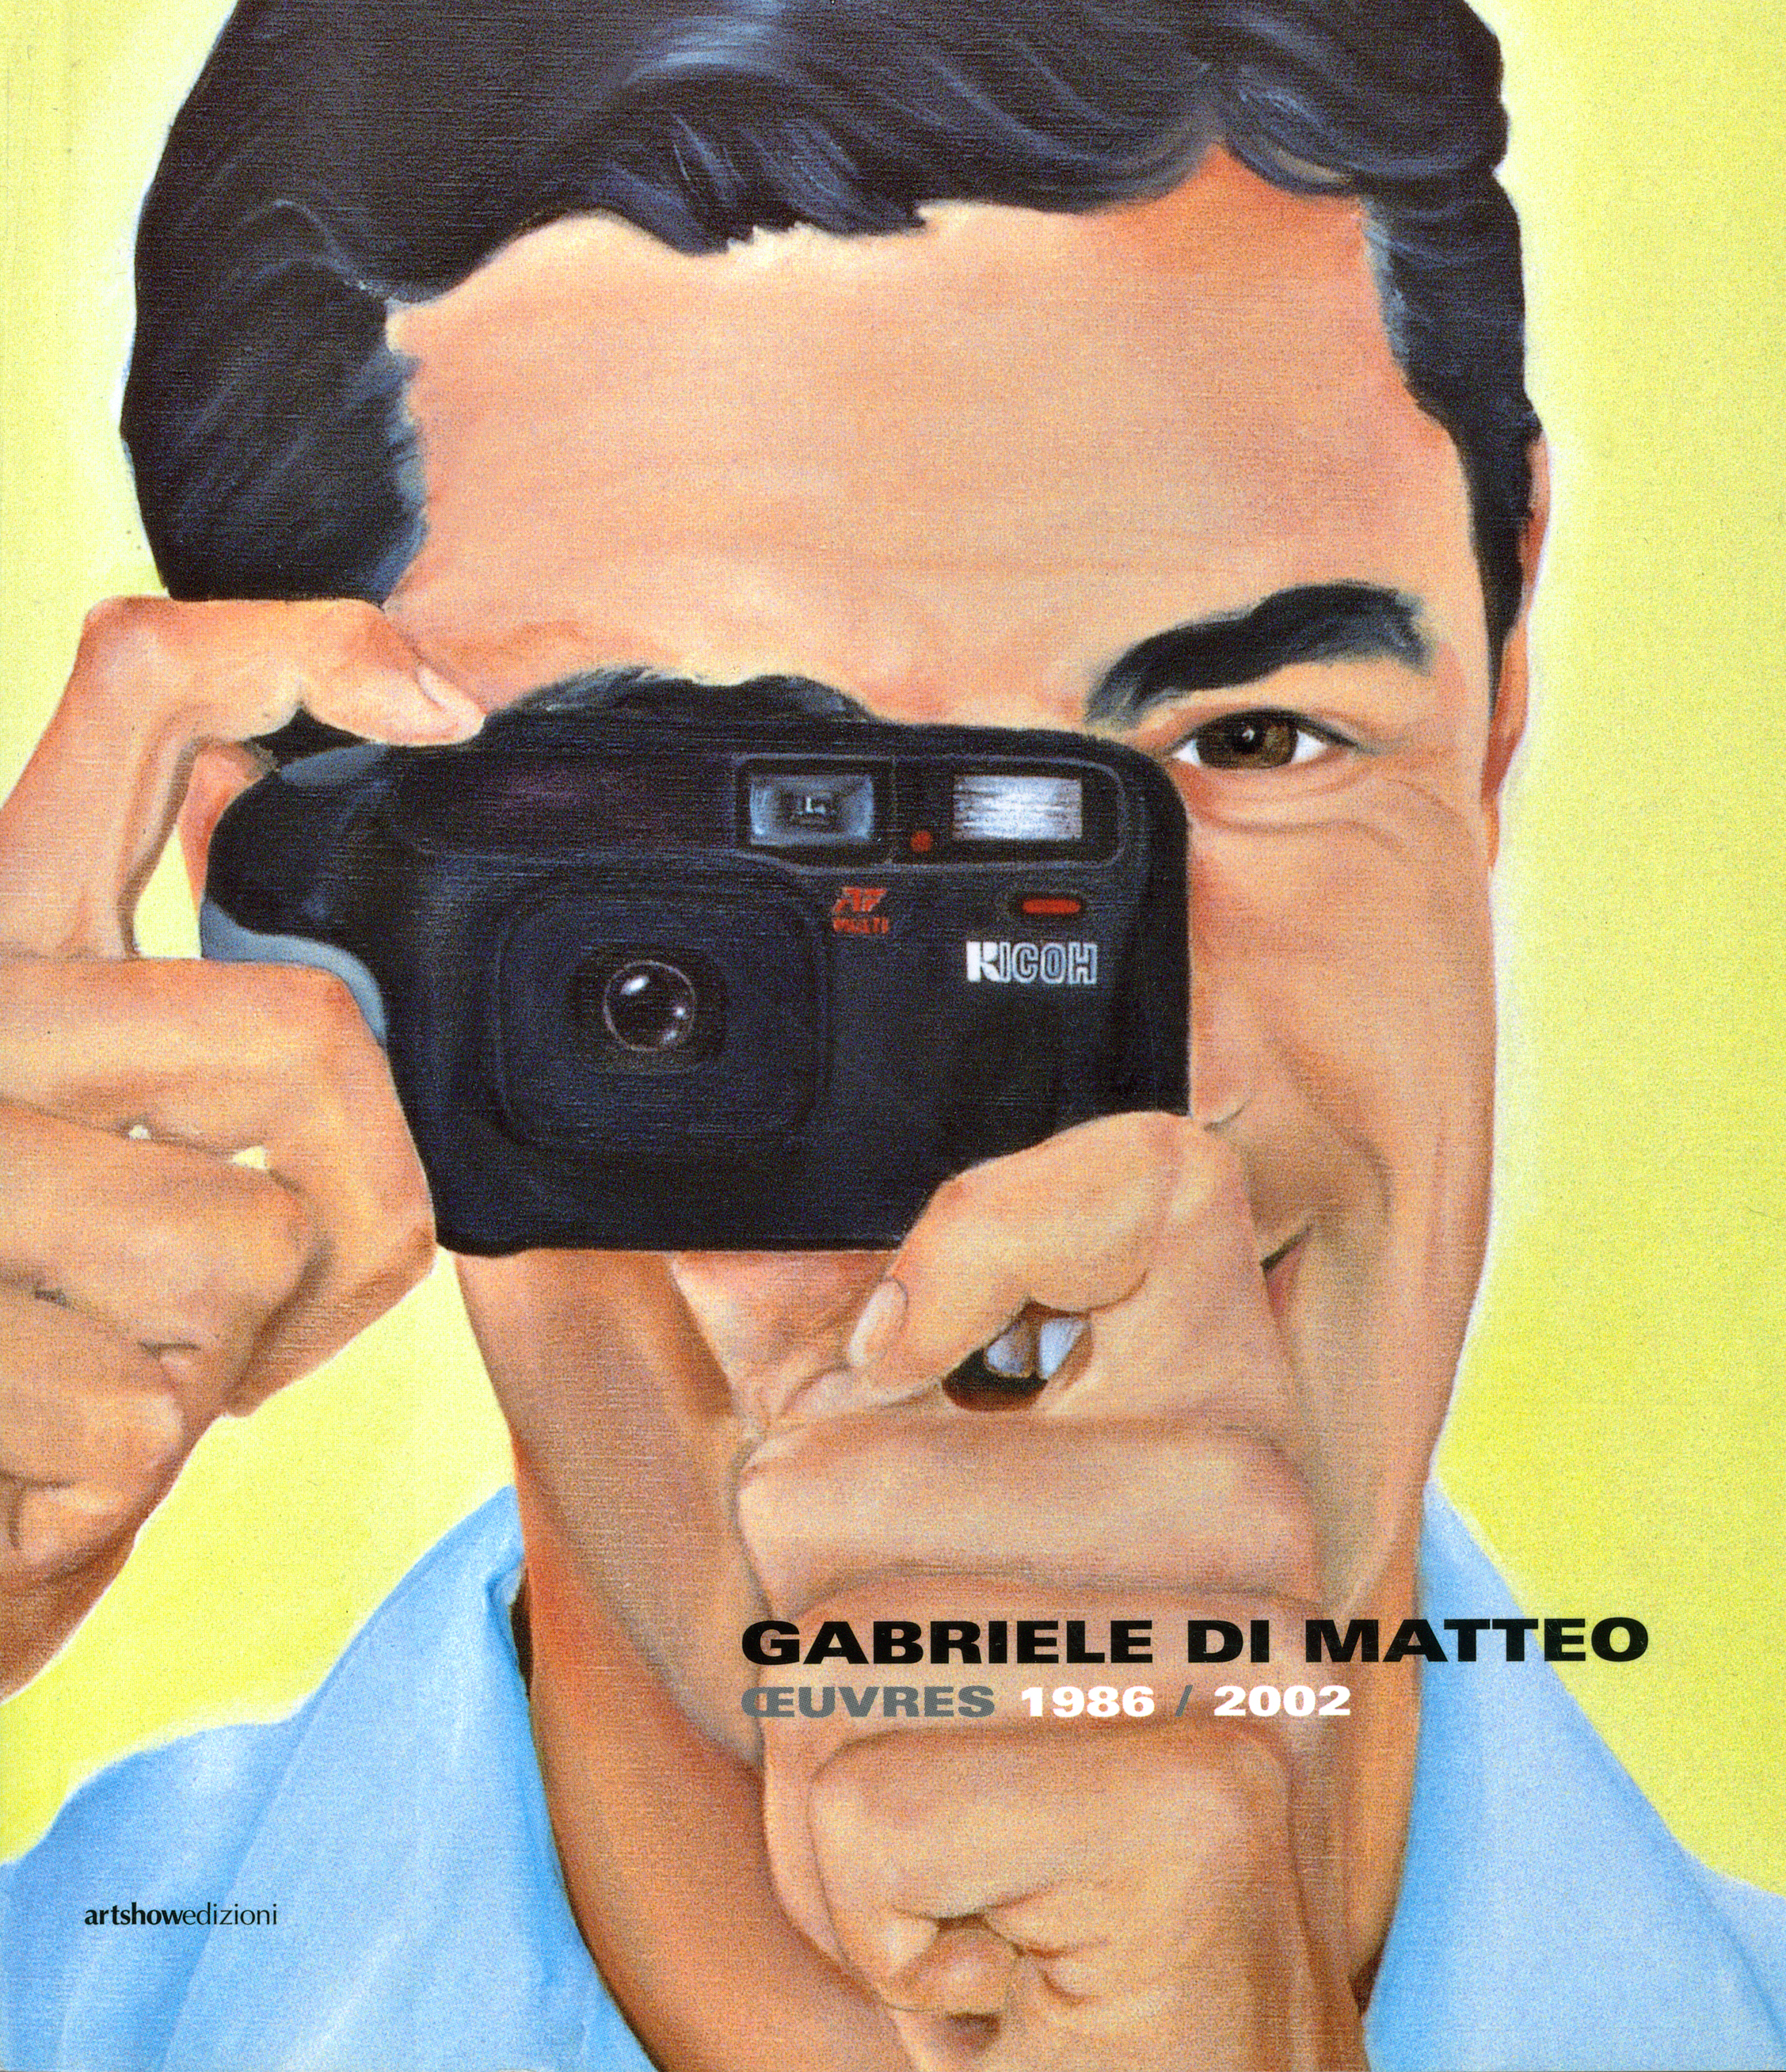 Gabriele Di Matteo: Oeuvres 1986/2002 - Cover Image